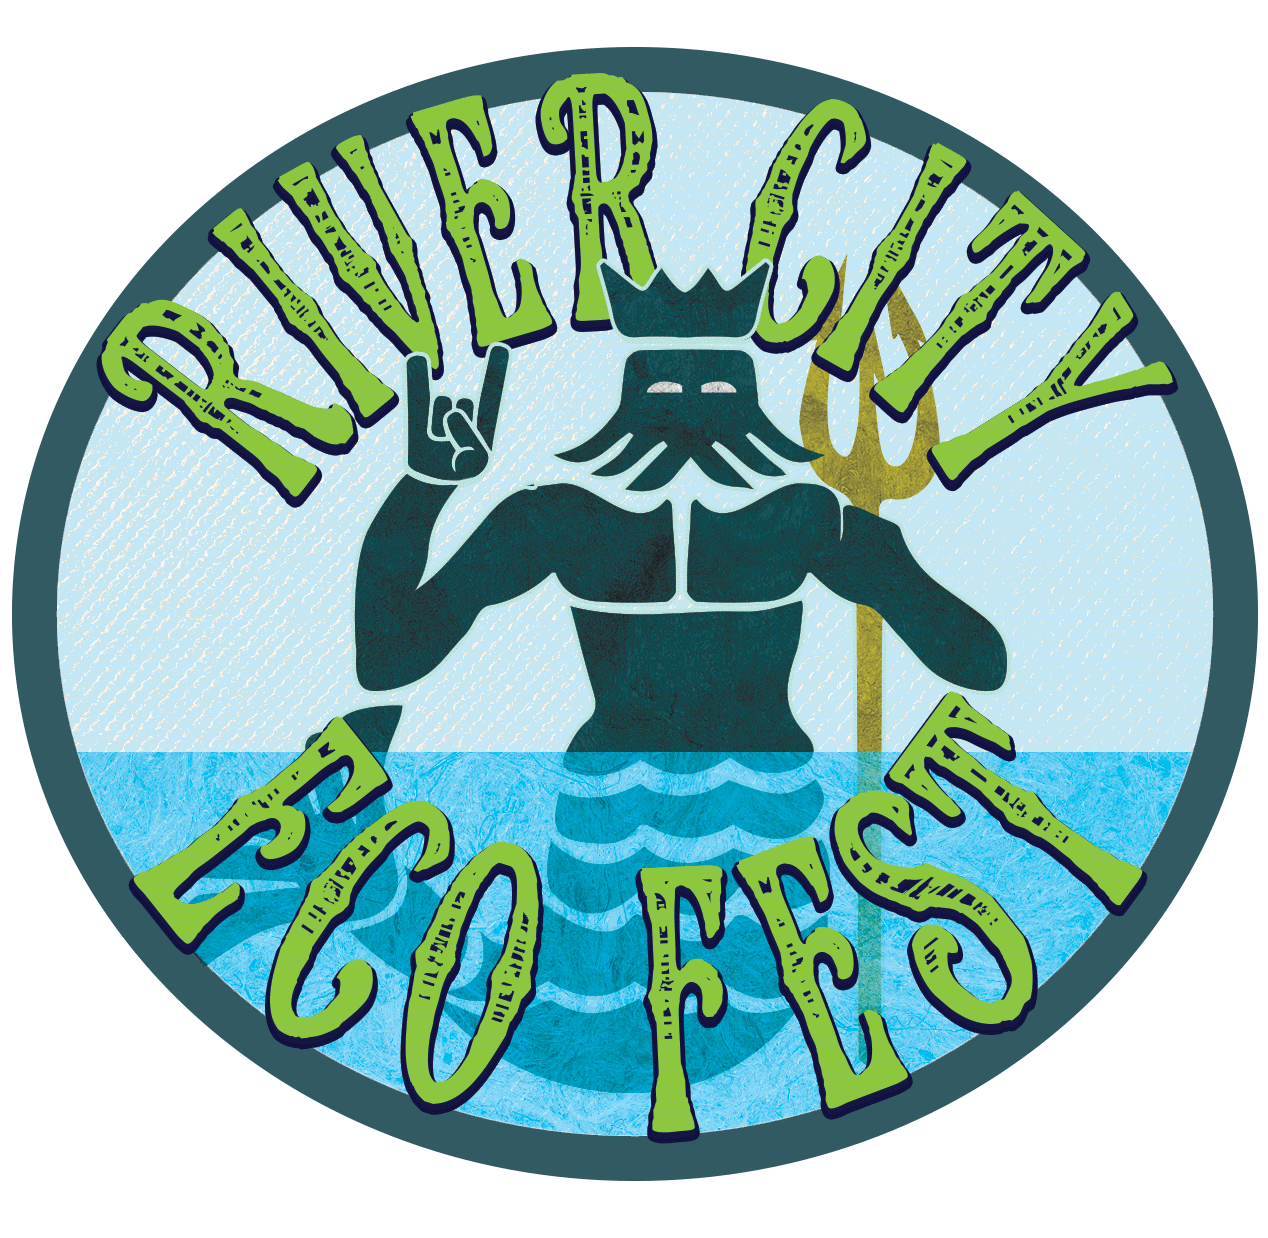 River City Eco Frest in Jacksonville, Florida